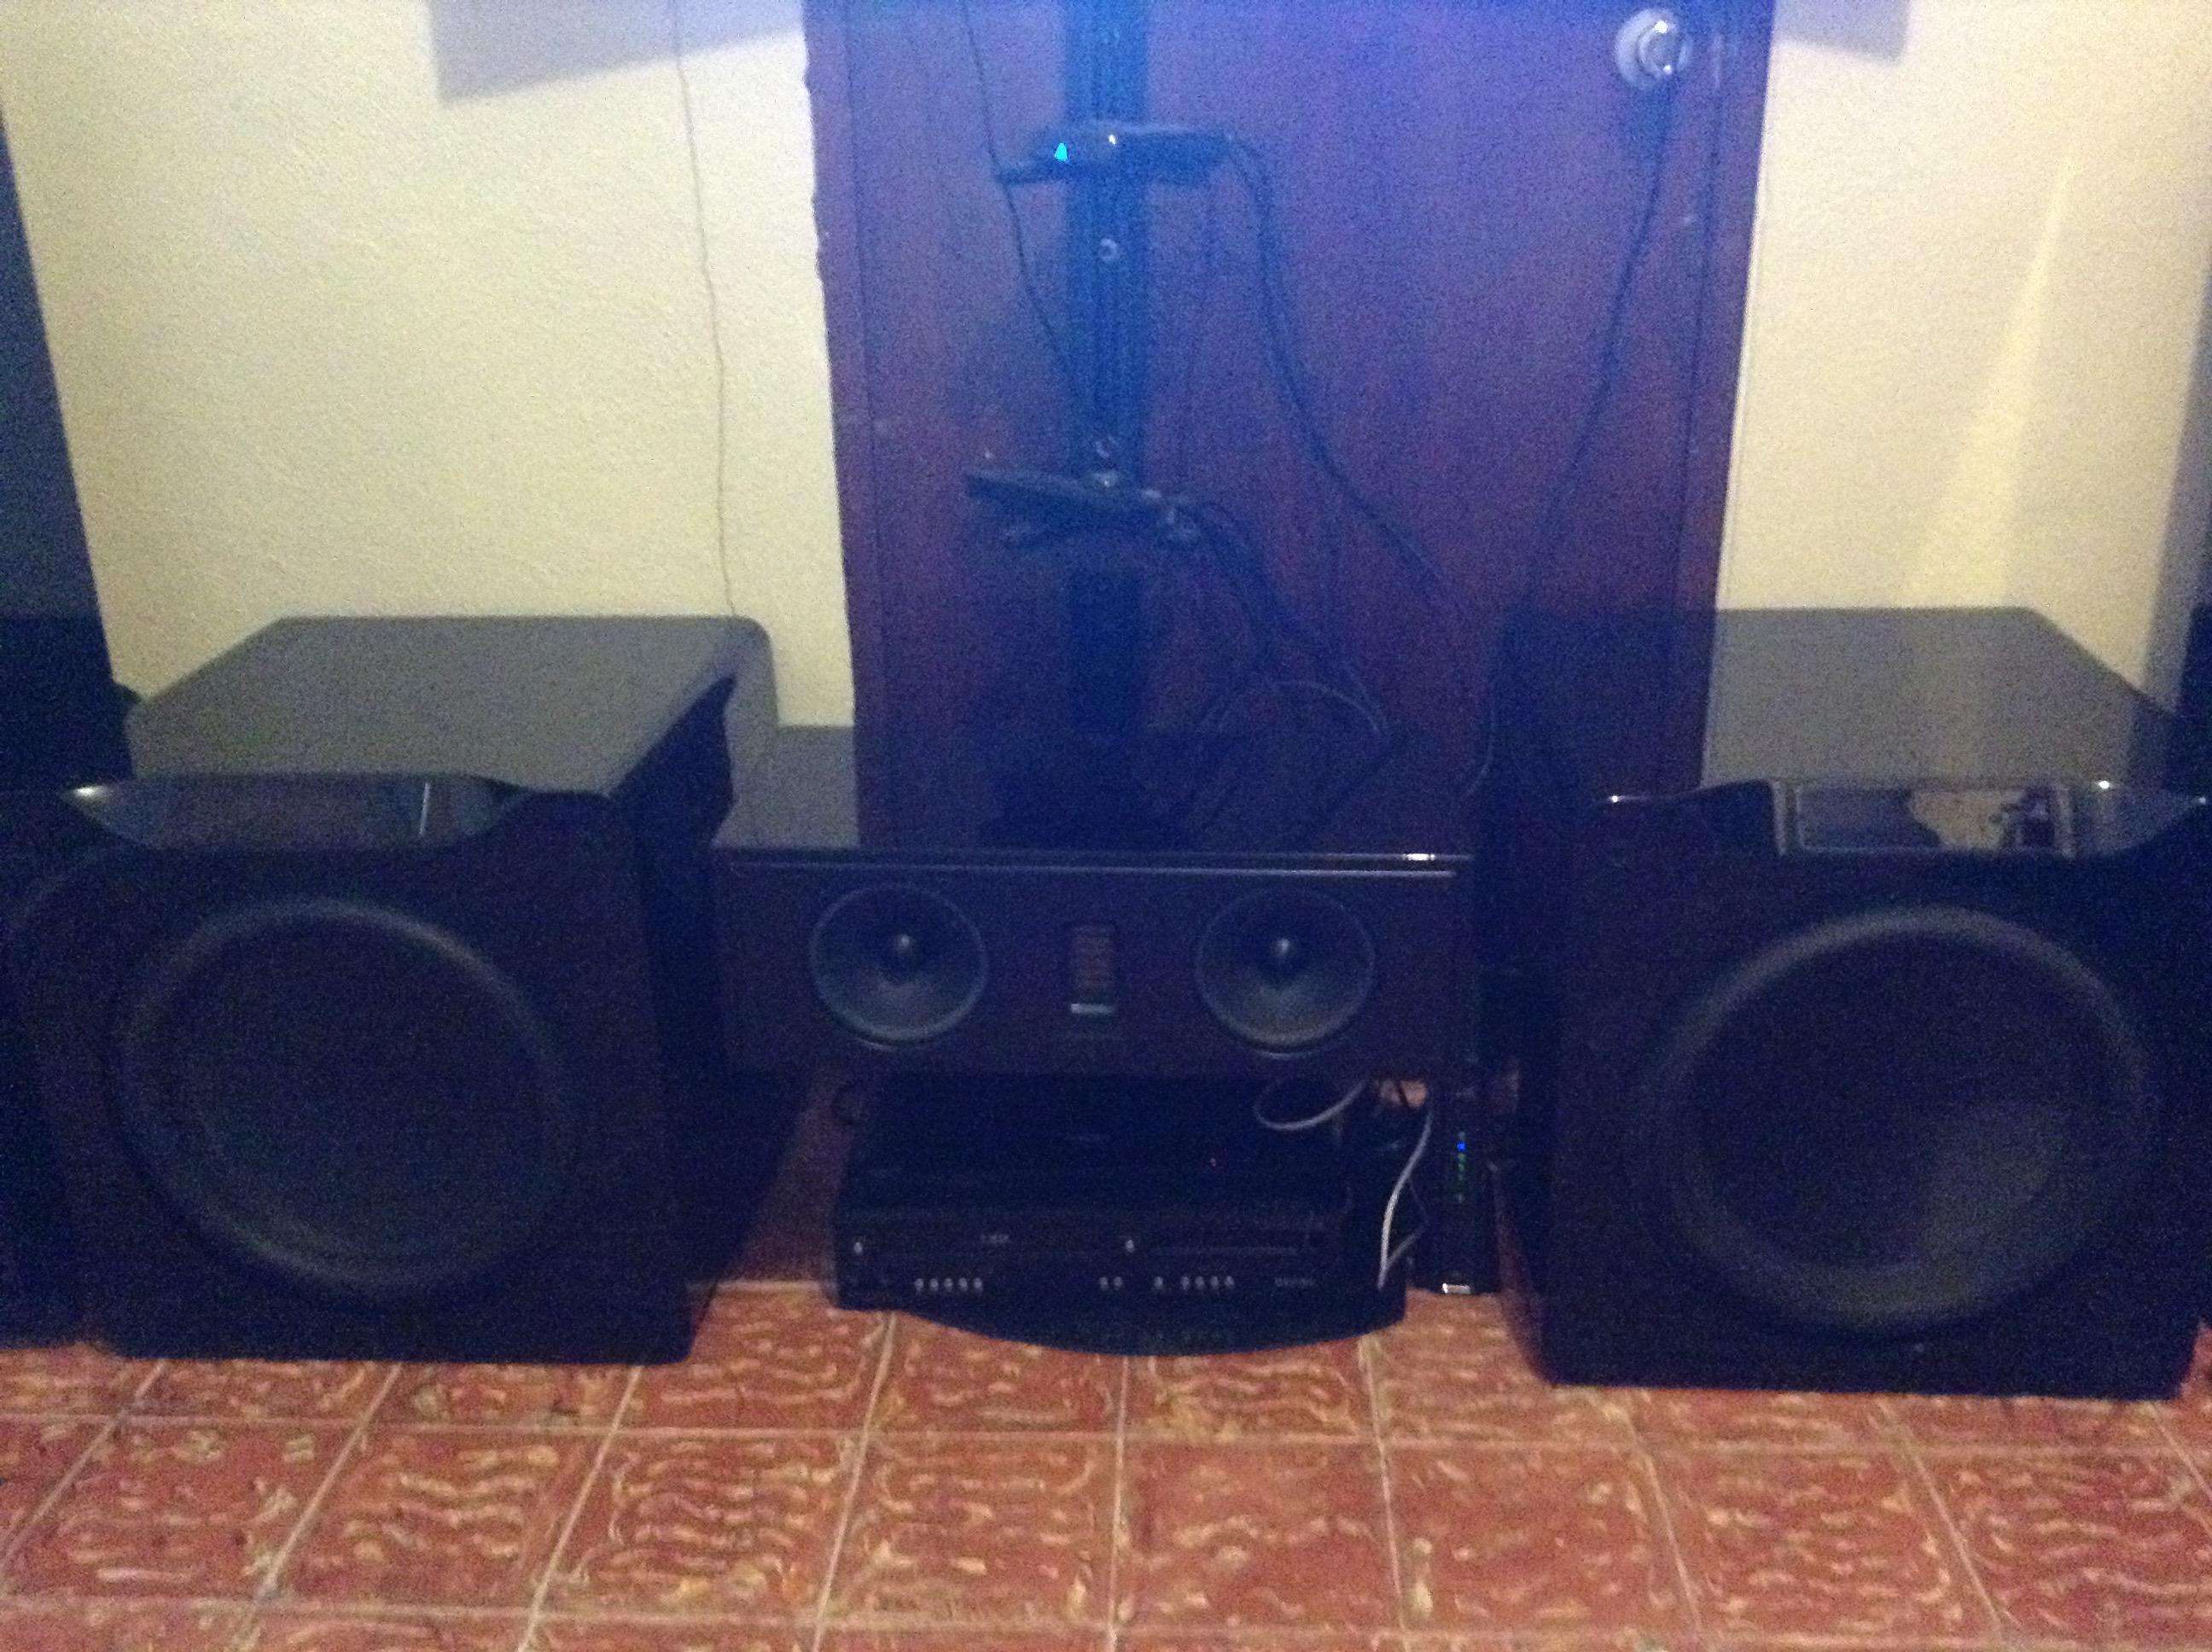 Marantz sr7011 and anthem mrx 1120 much diference in sound